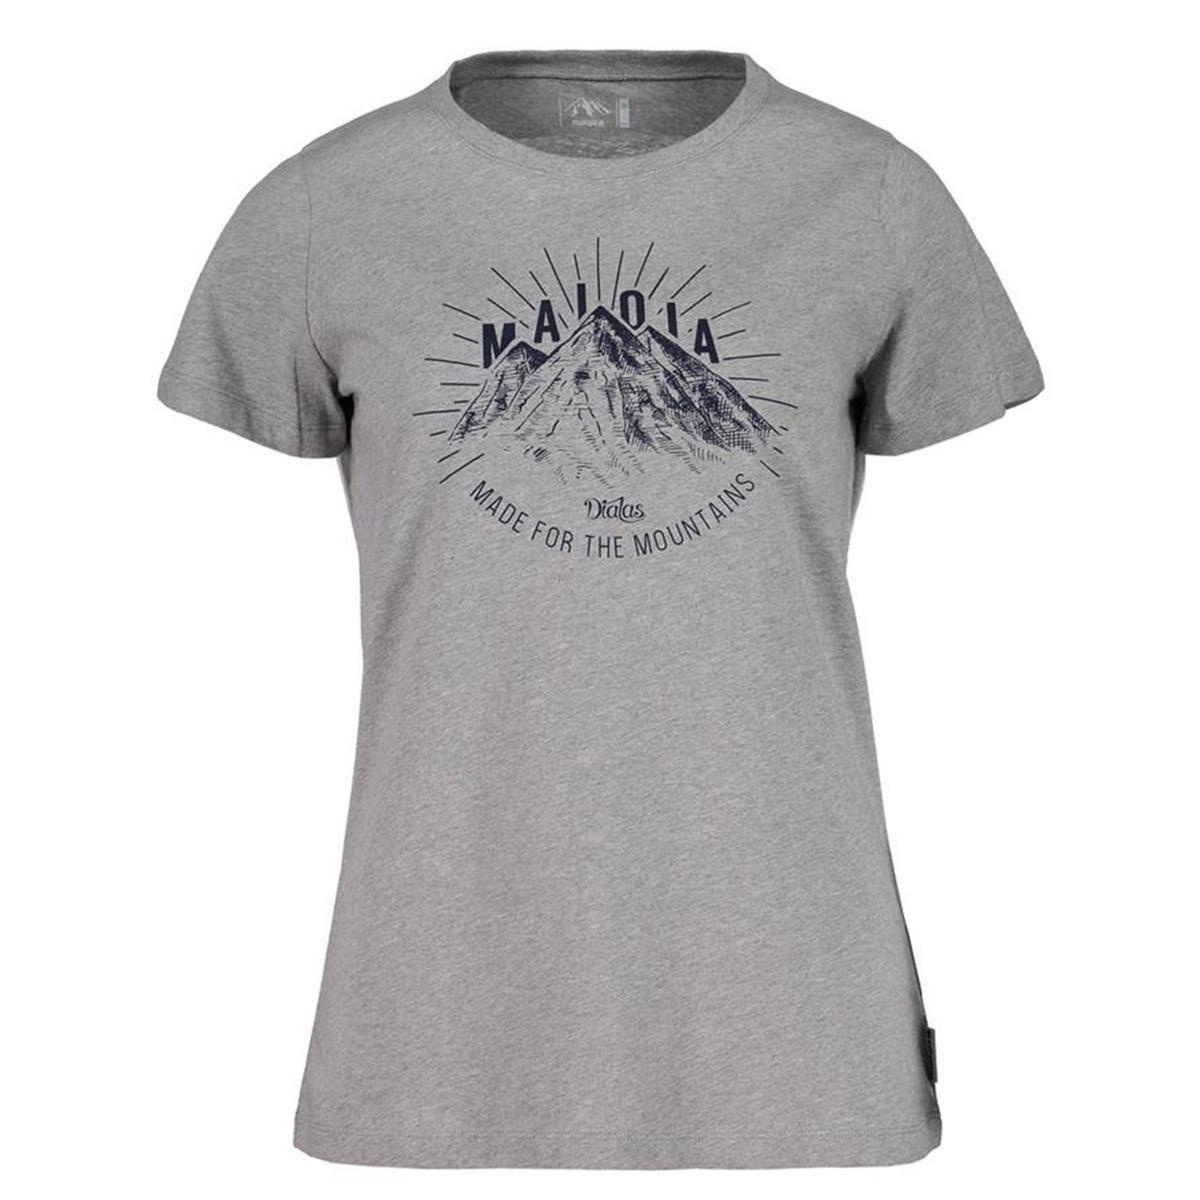 Maloja Girls T-Shirt RiccardaM. Grey Melange